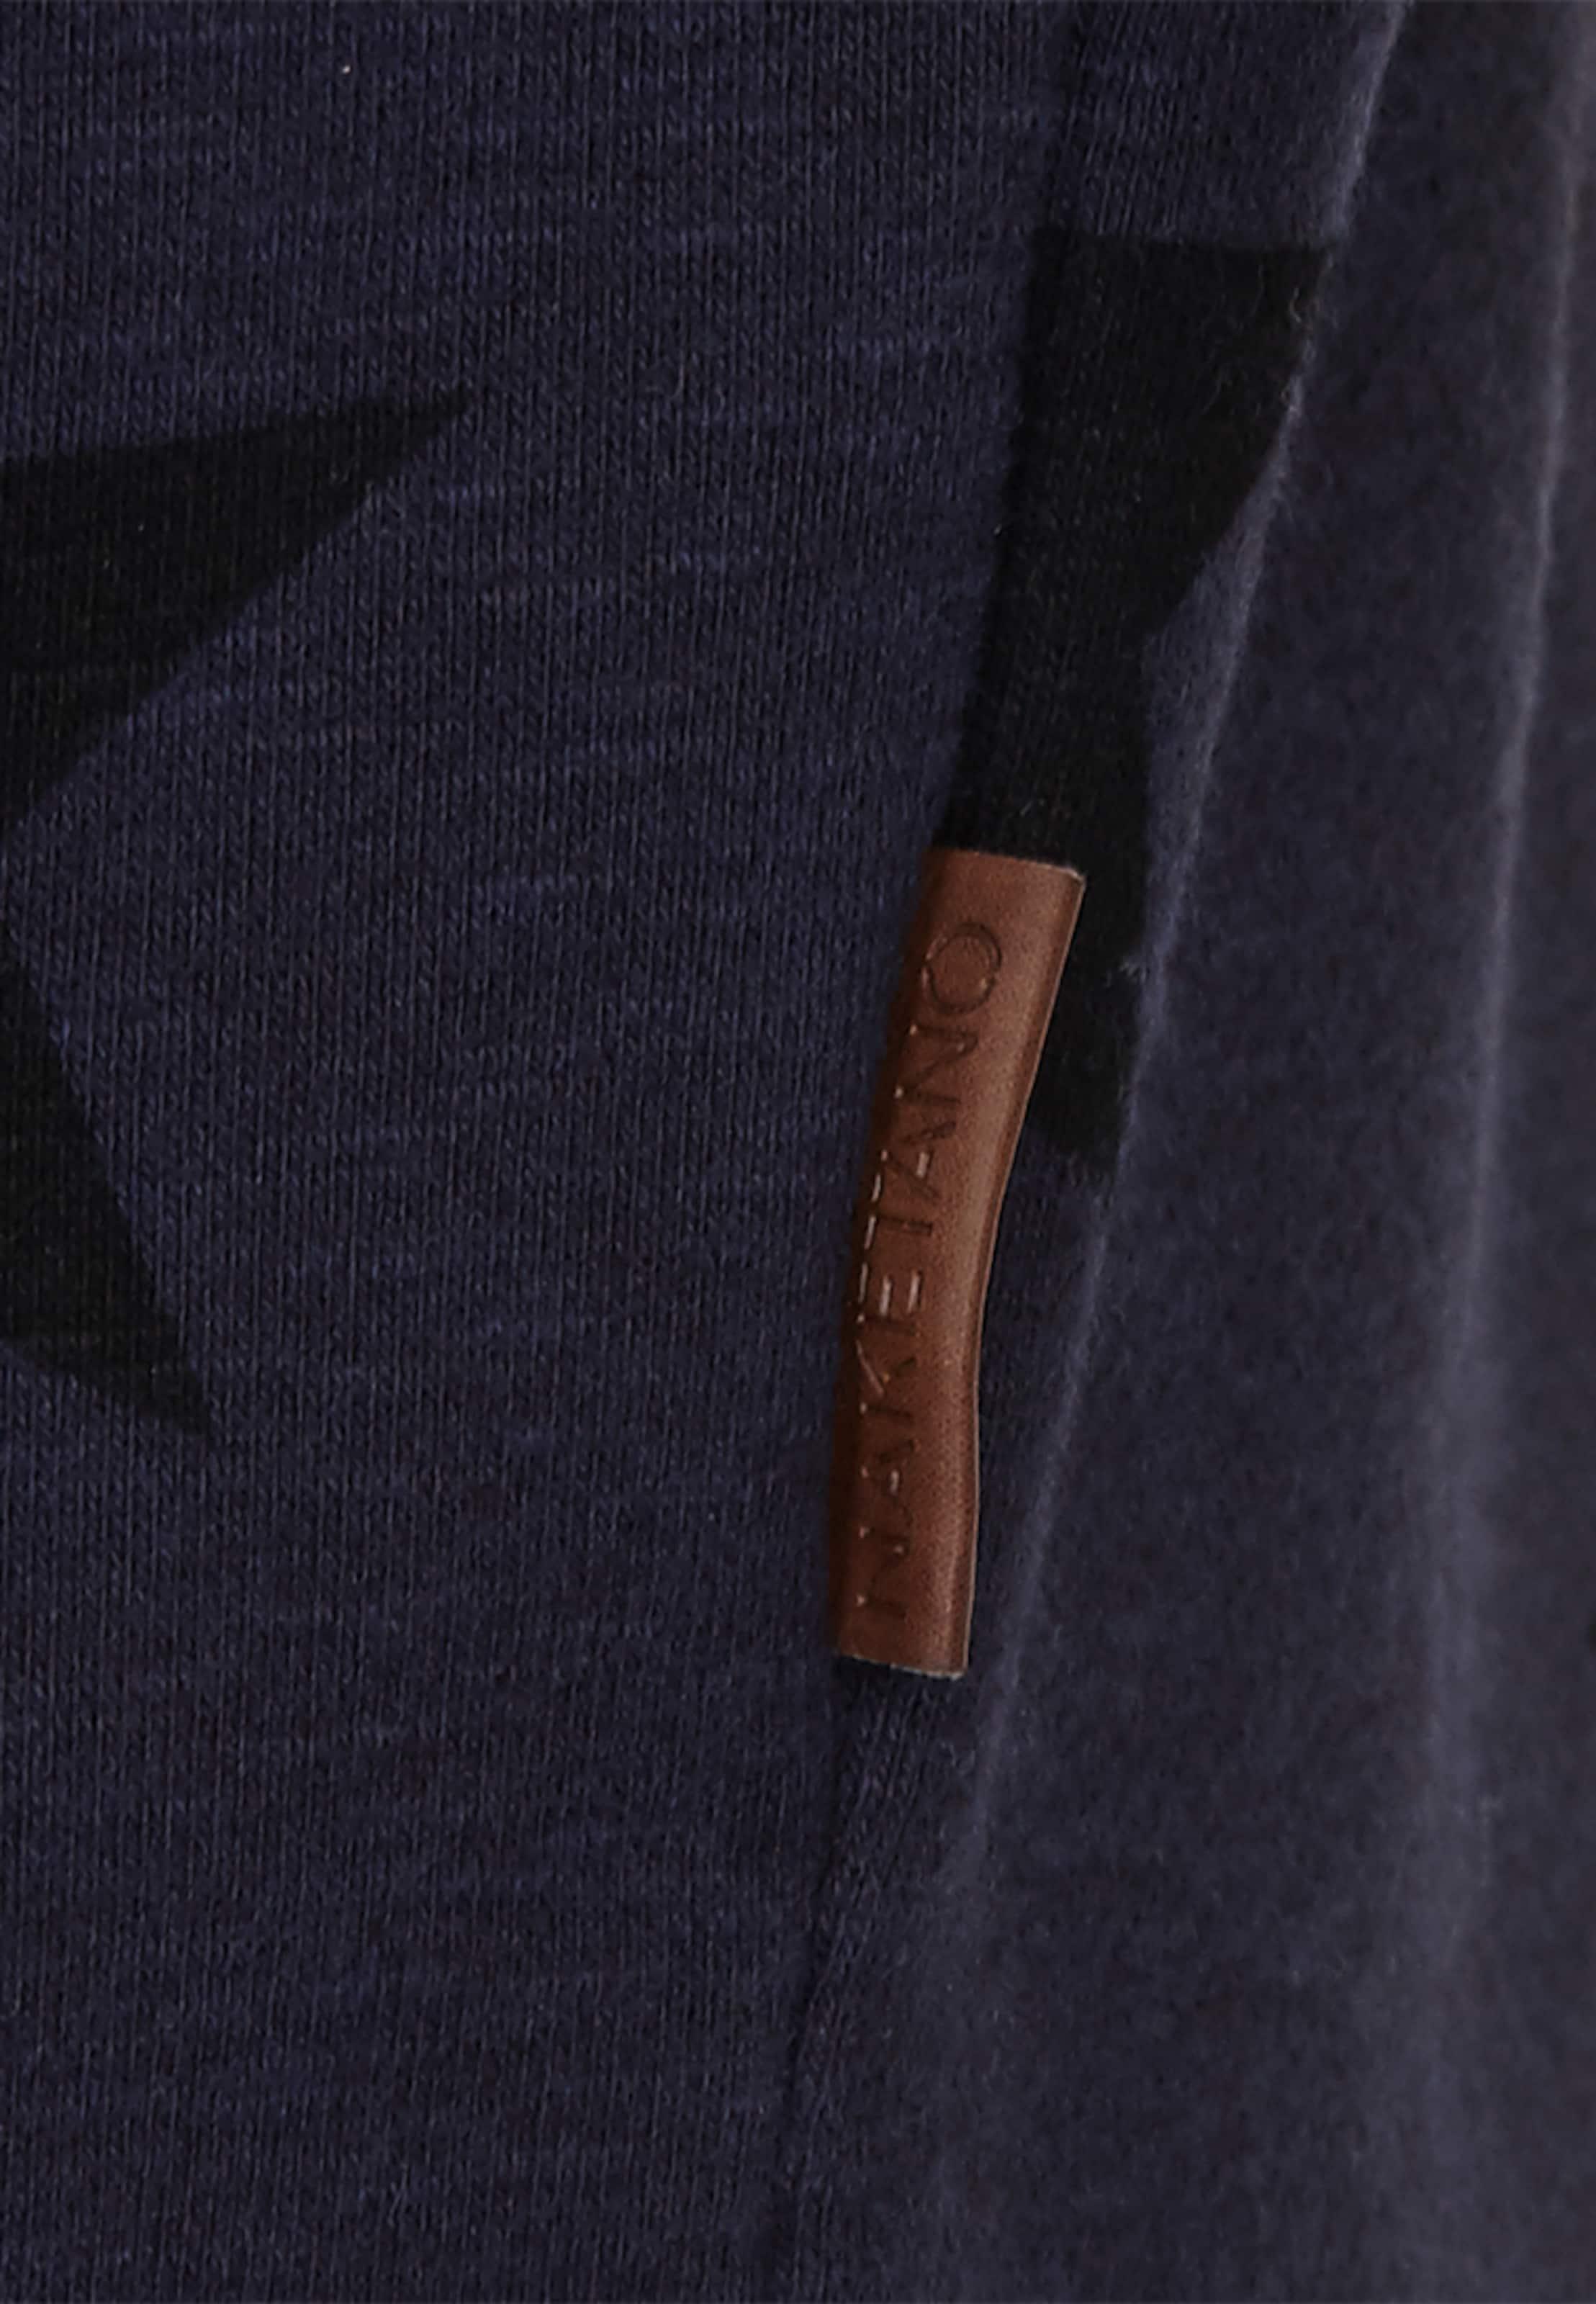 Sweatshirt Naketano Iii DunkelblauSchwarz Male In Frittenklaus KJl31cFT